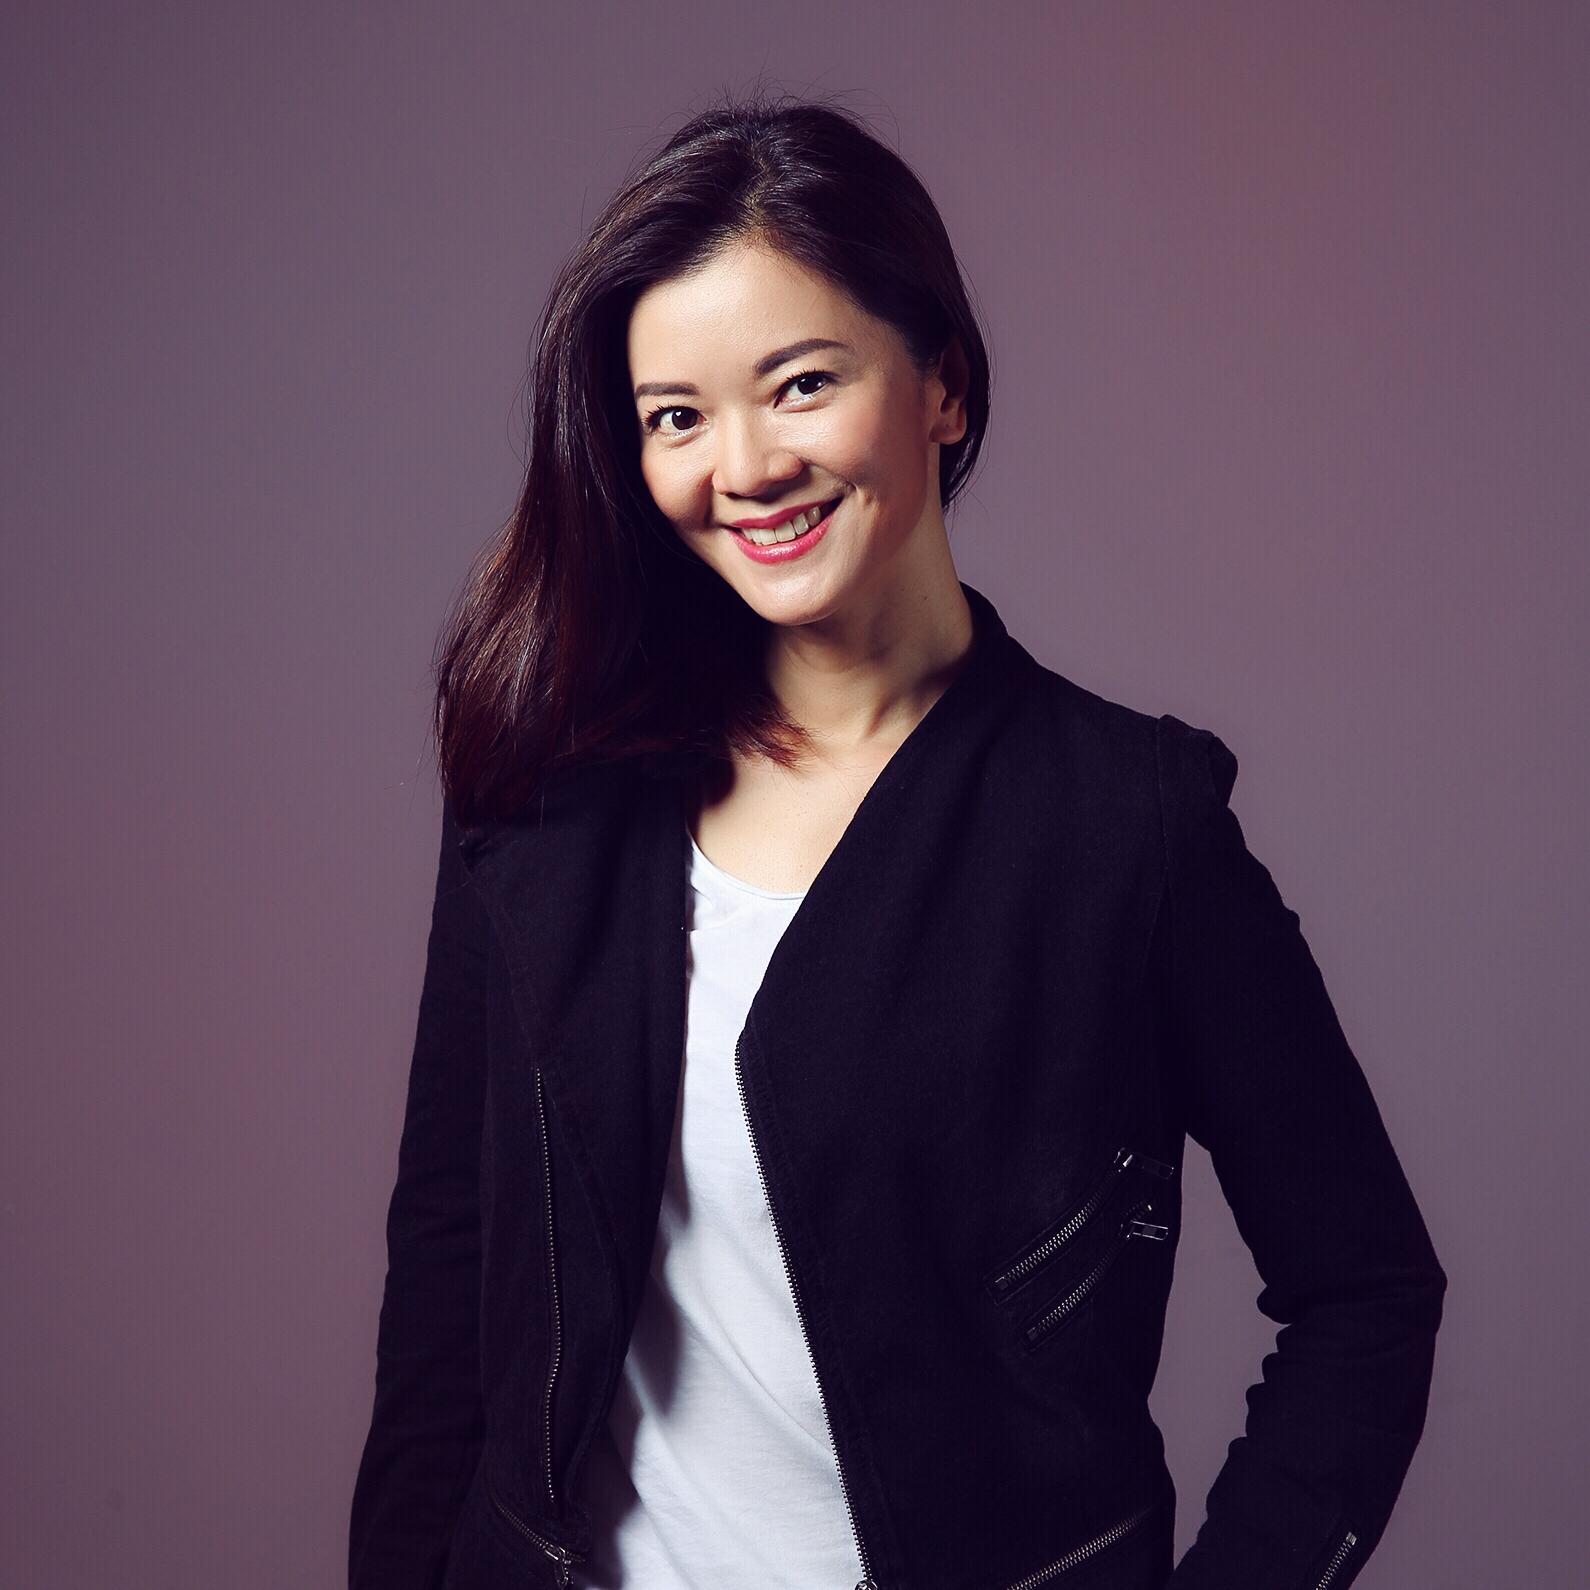 Michelle Chong's Photo 3 (Please credit Michelle as Left Profile Artiste) (2).JPG